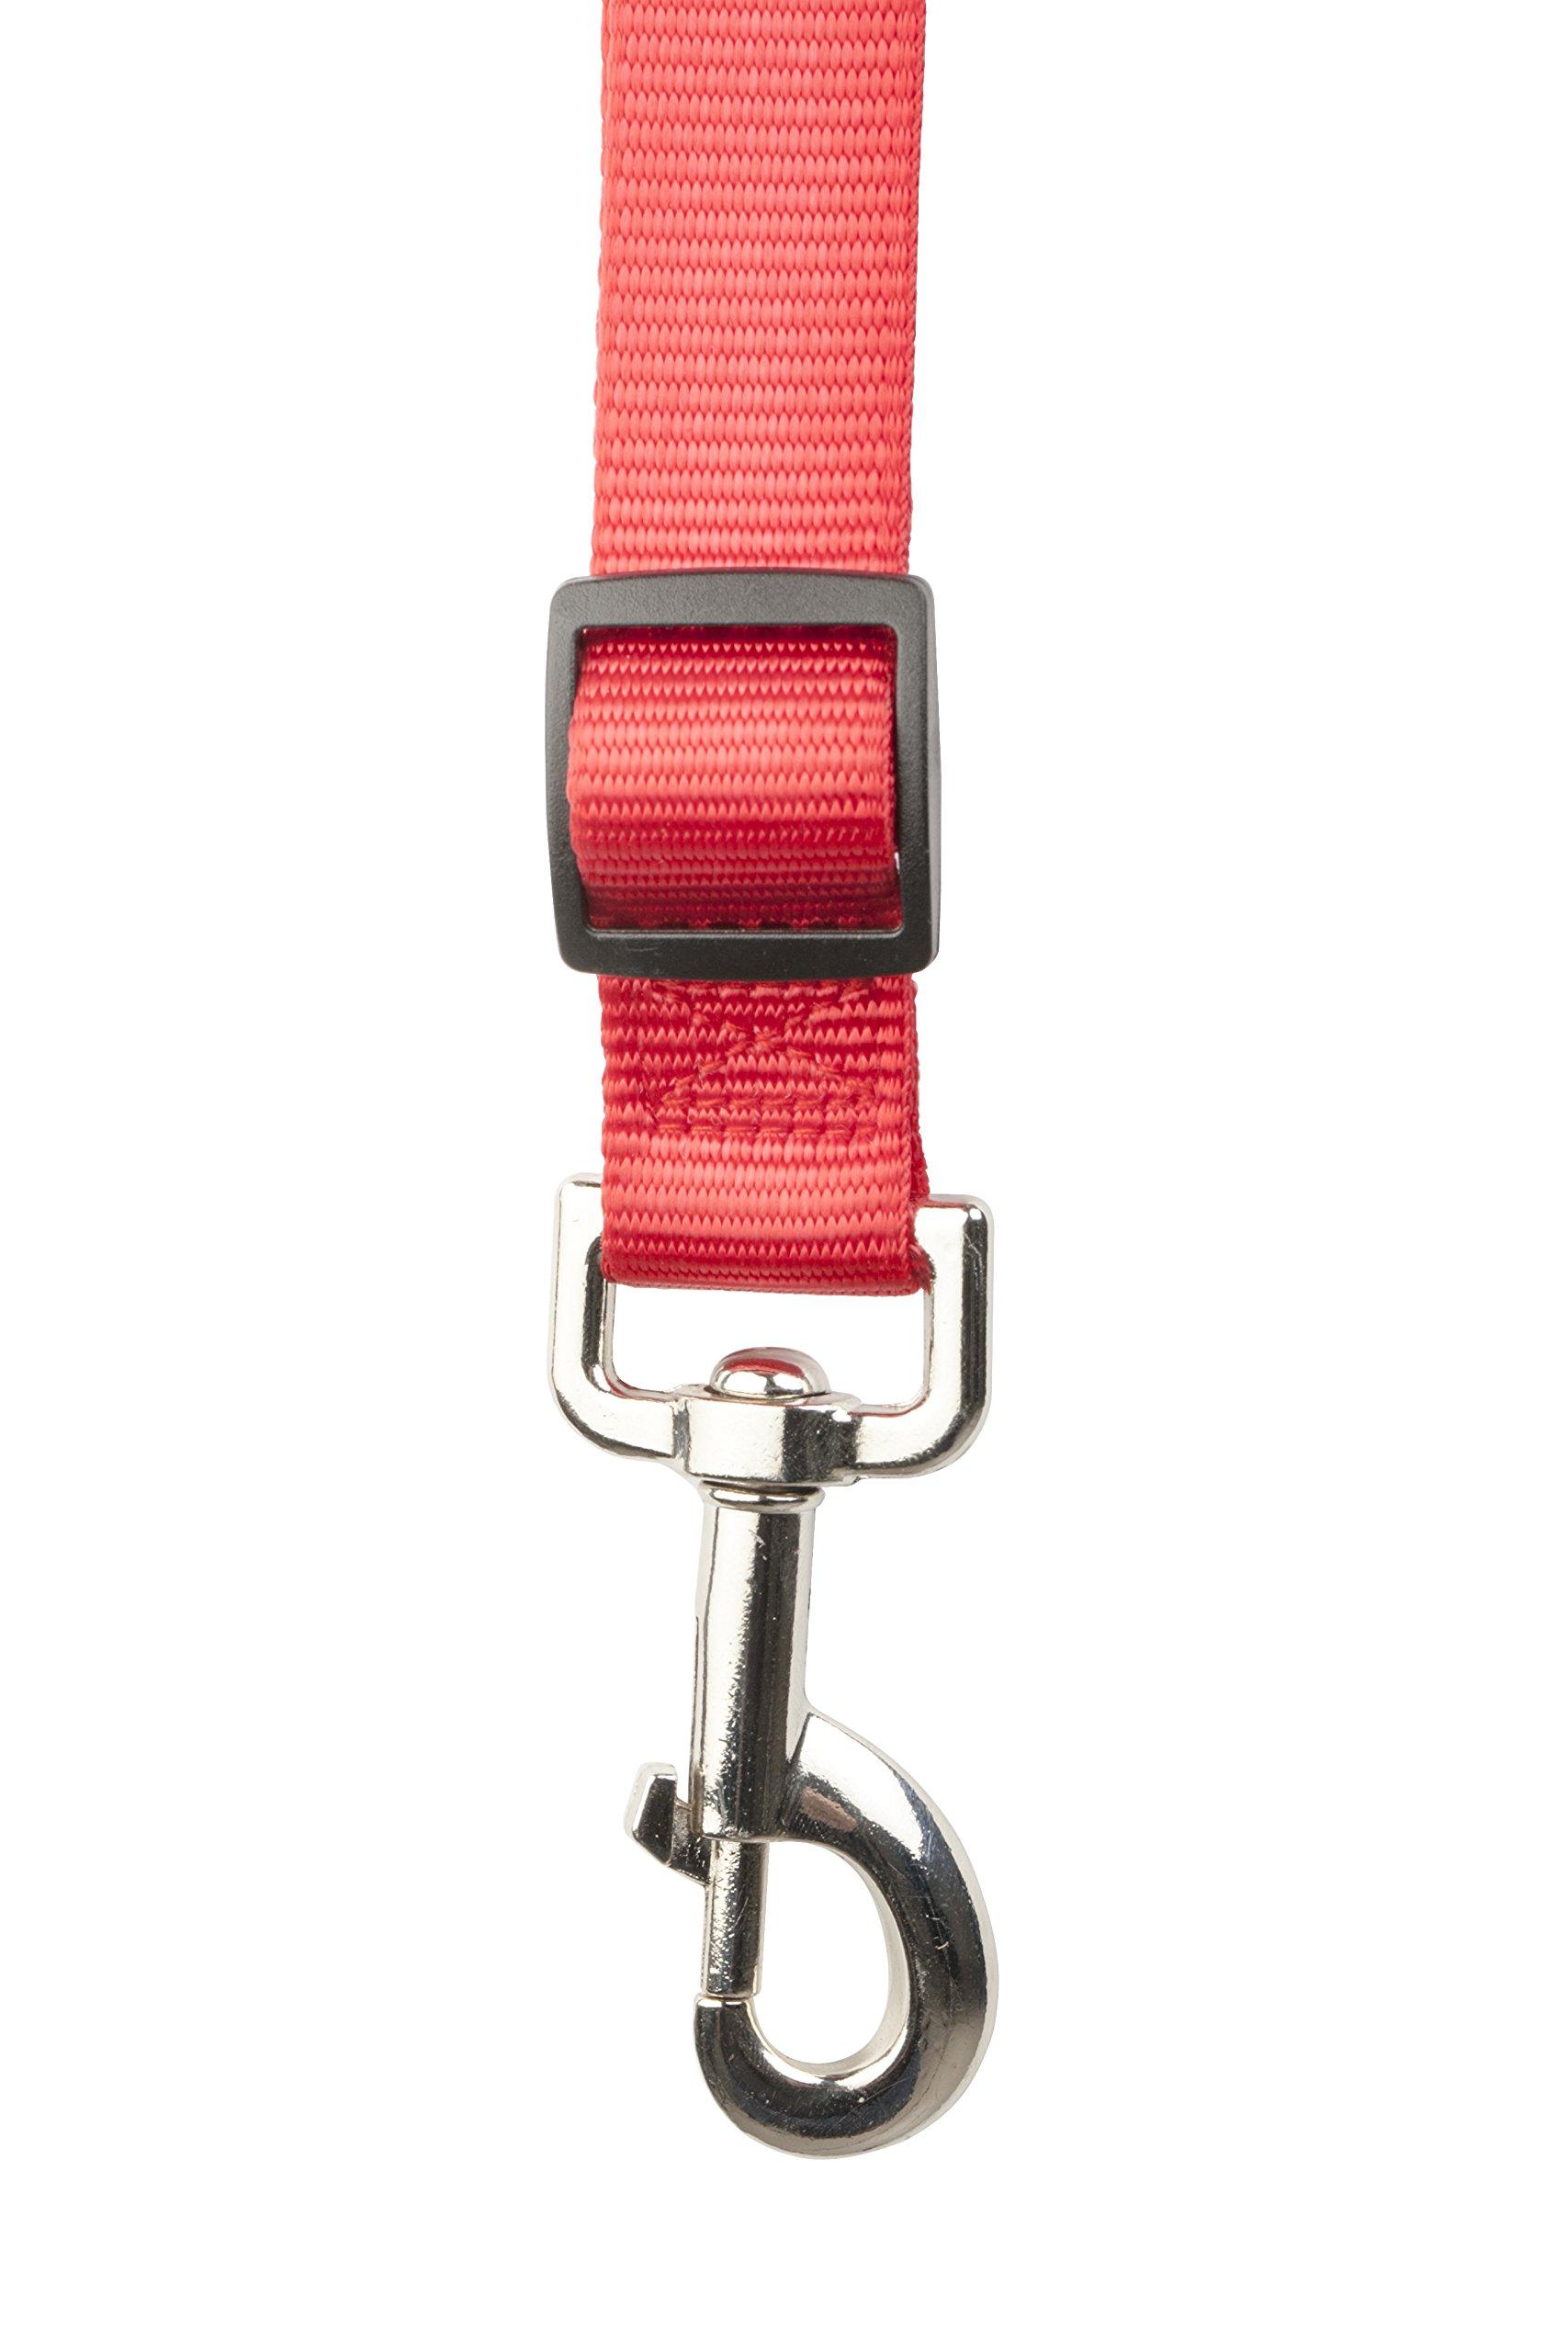 Running Dog Leash Hands Free - Including LED Light. Great for Walking, Running, Biking and Jogging (Black, Red, Blue, Orange, Pink)). (Red)